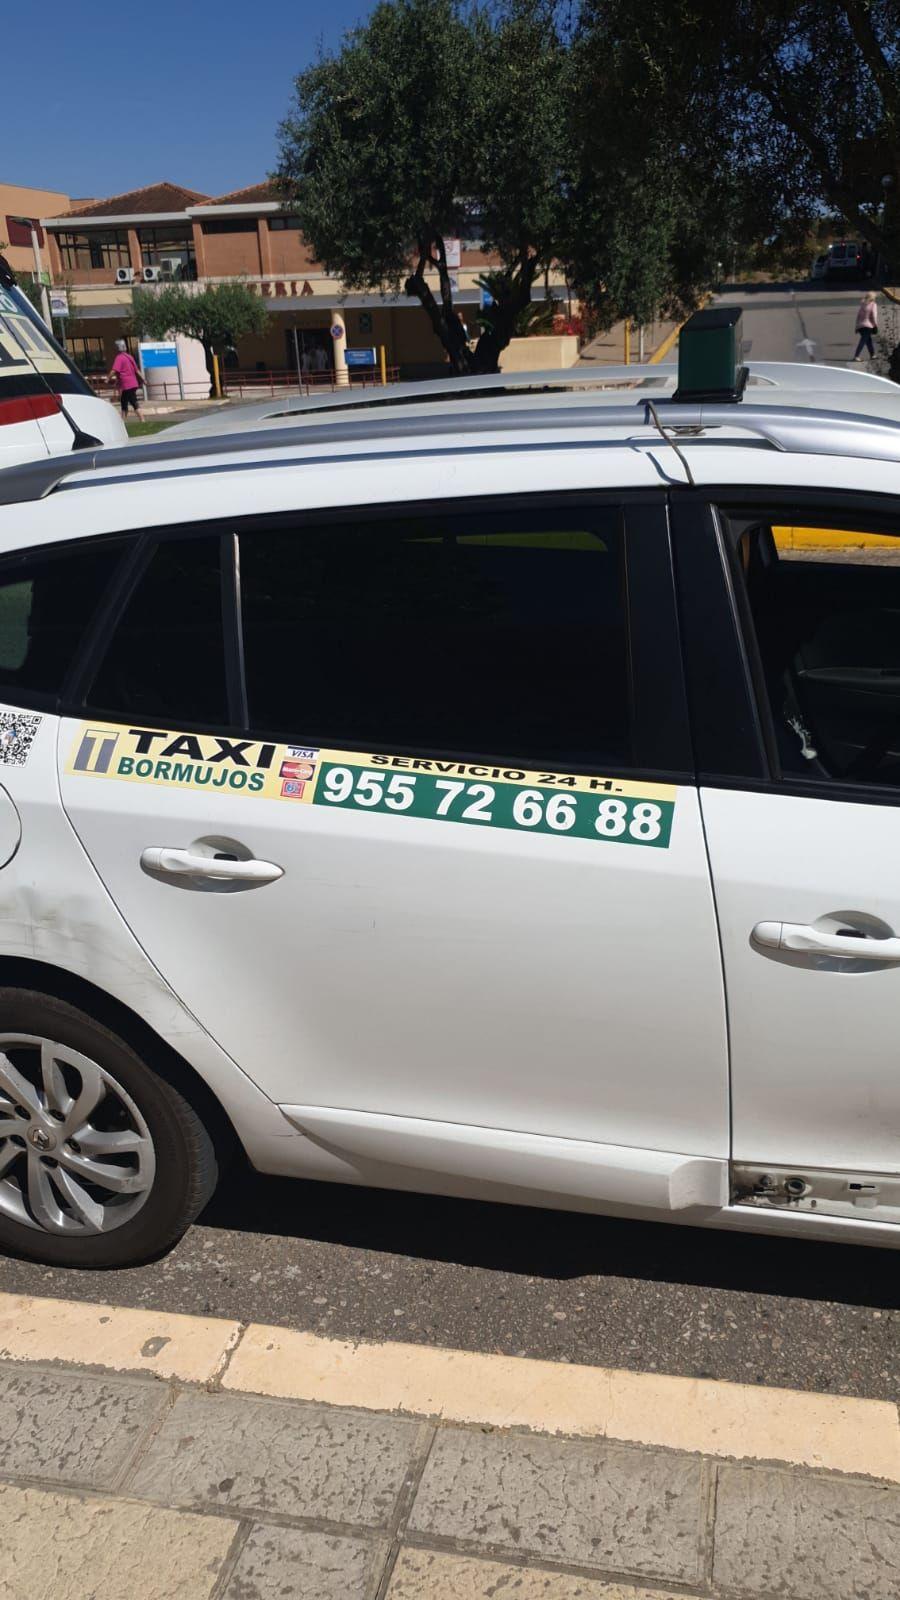 Viajes en taxi Bormujos